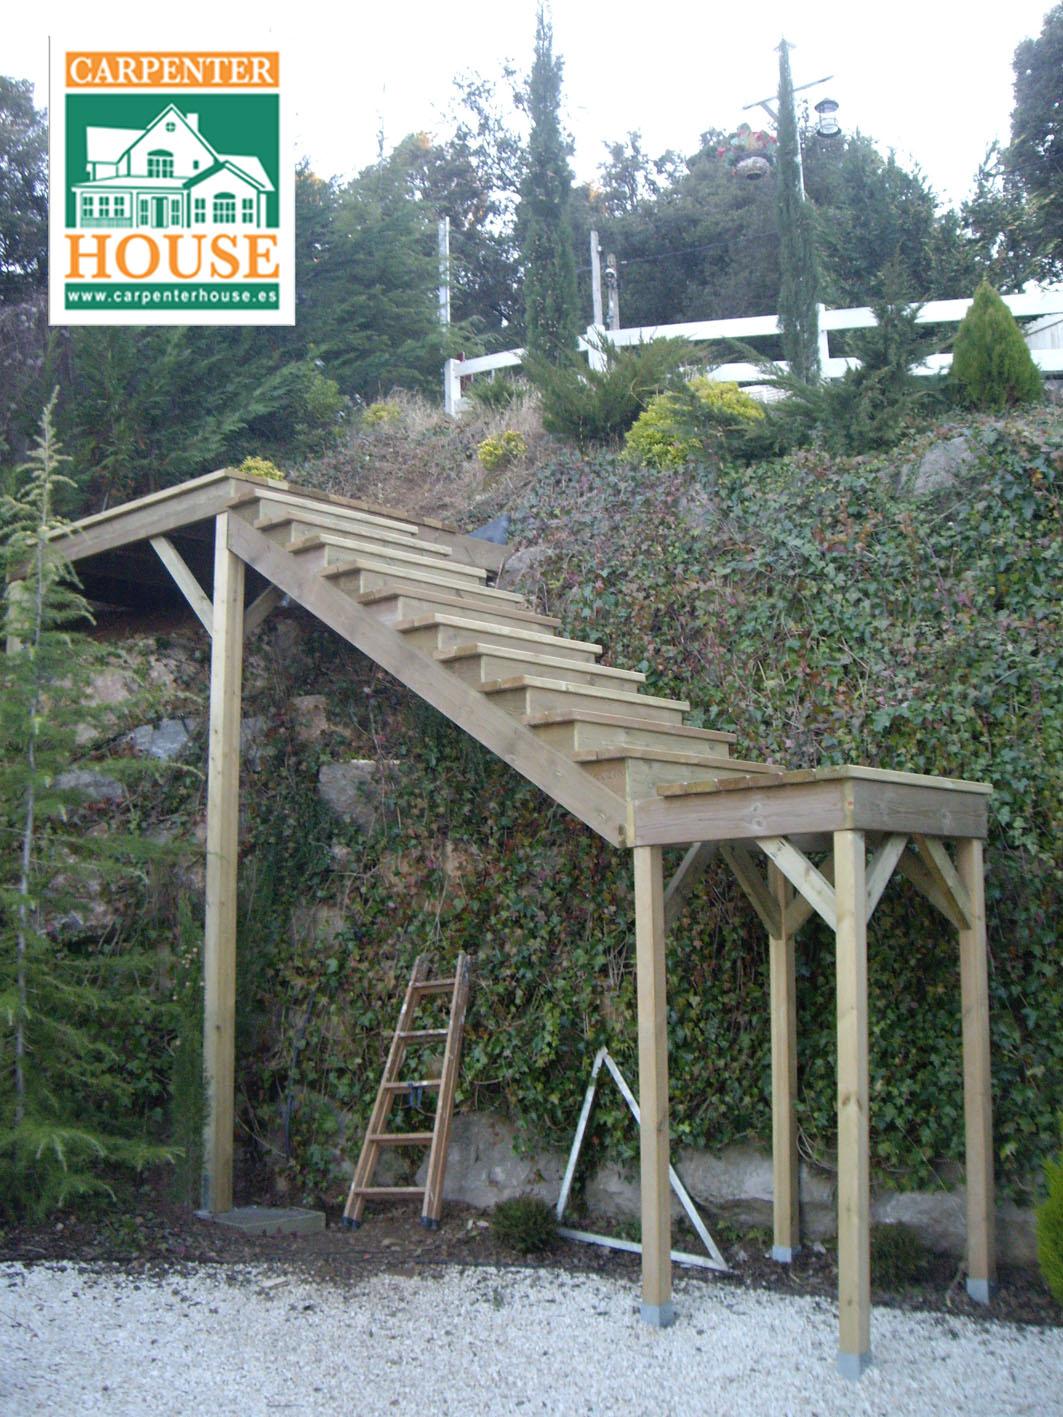 Carpenter House Construccion De Una Escalera Exterior - Escaleras-de-madera-para-exteriores